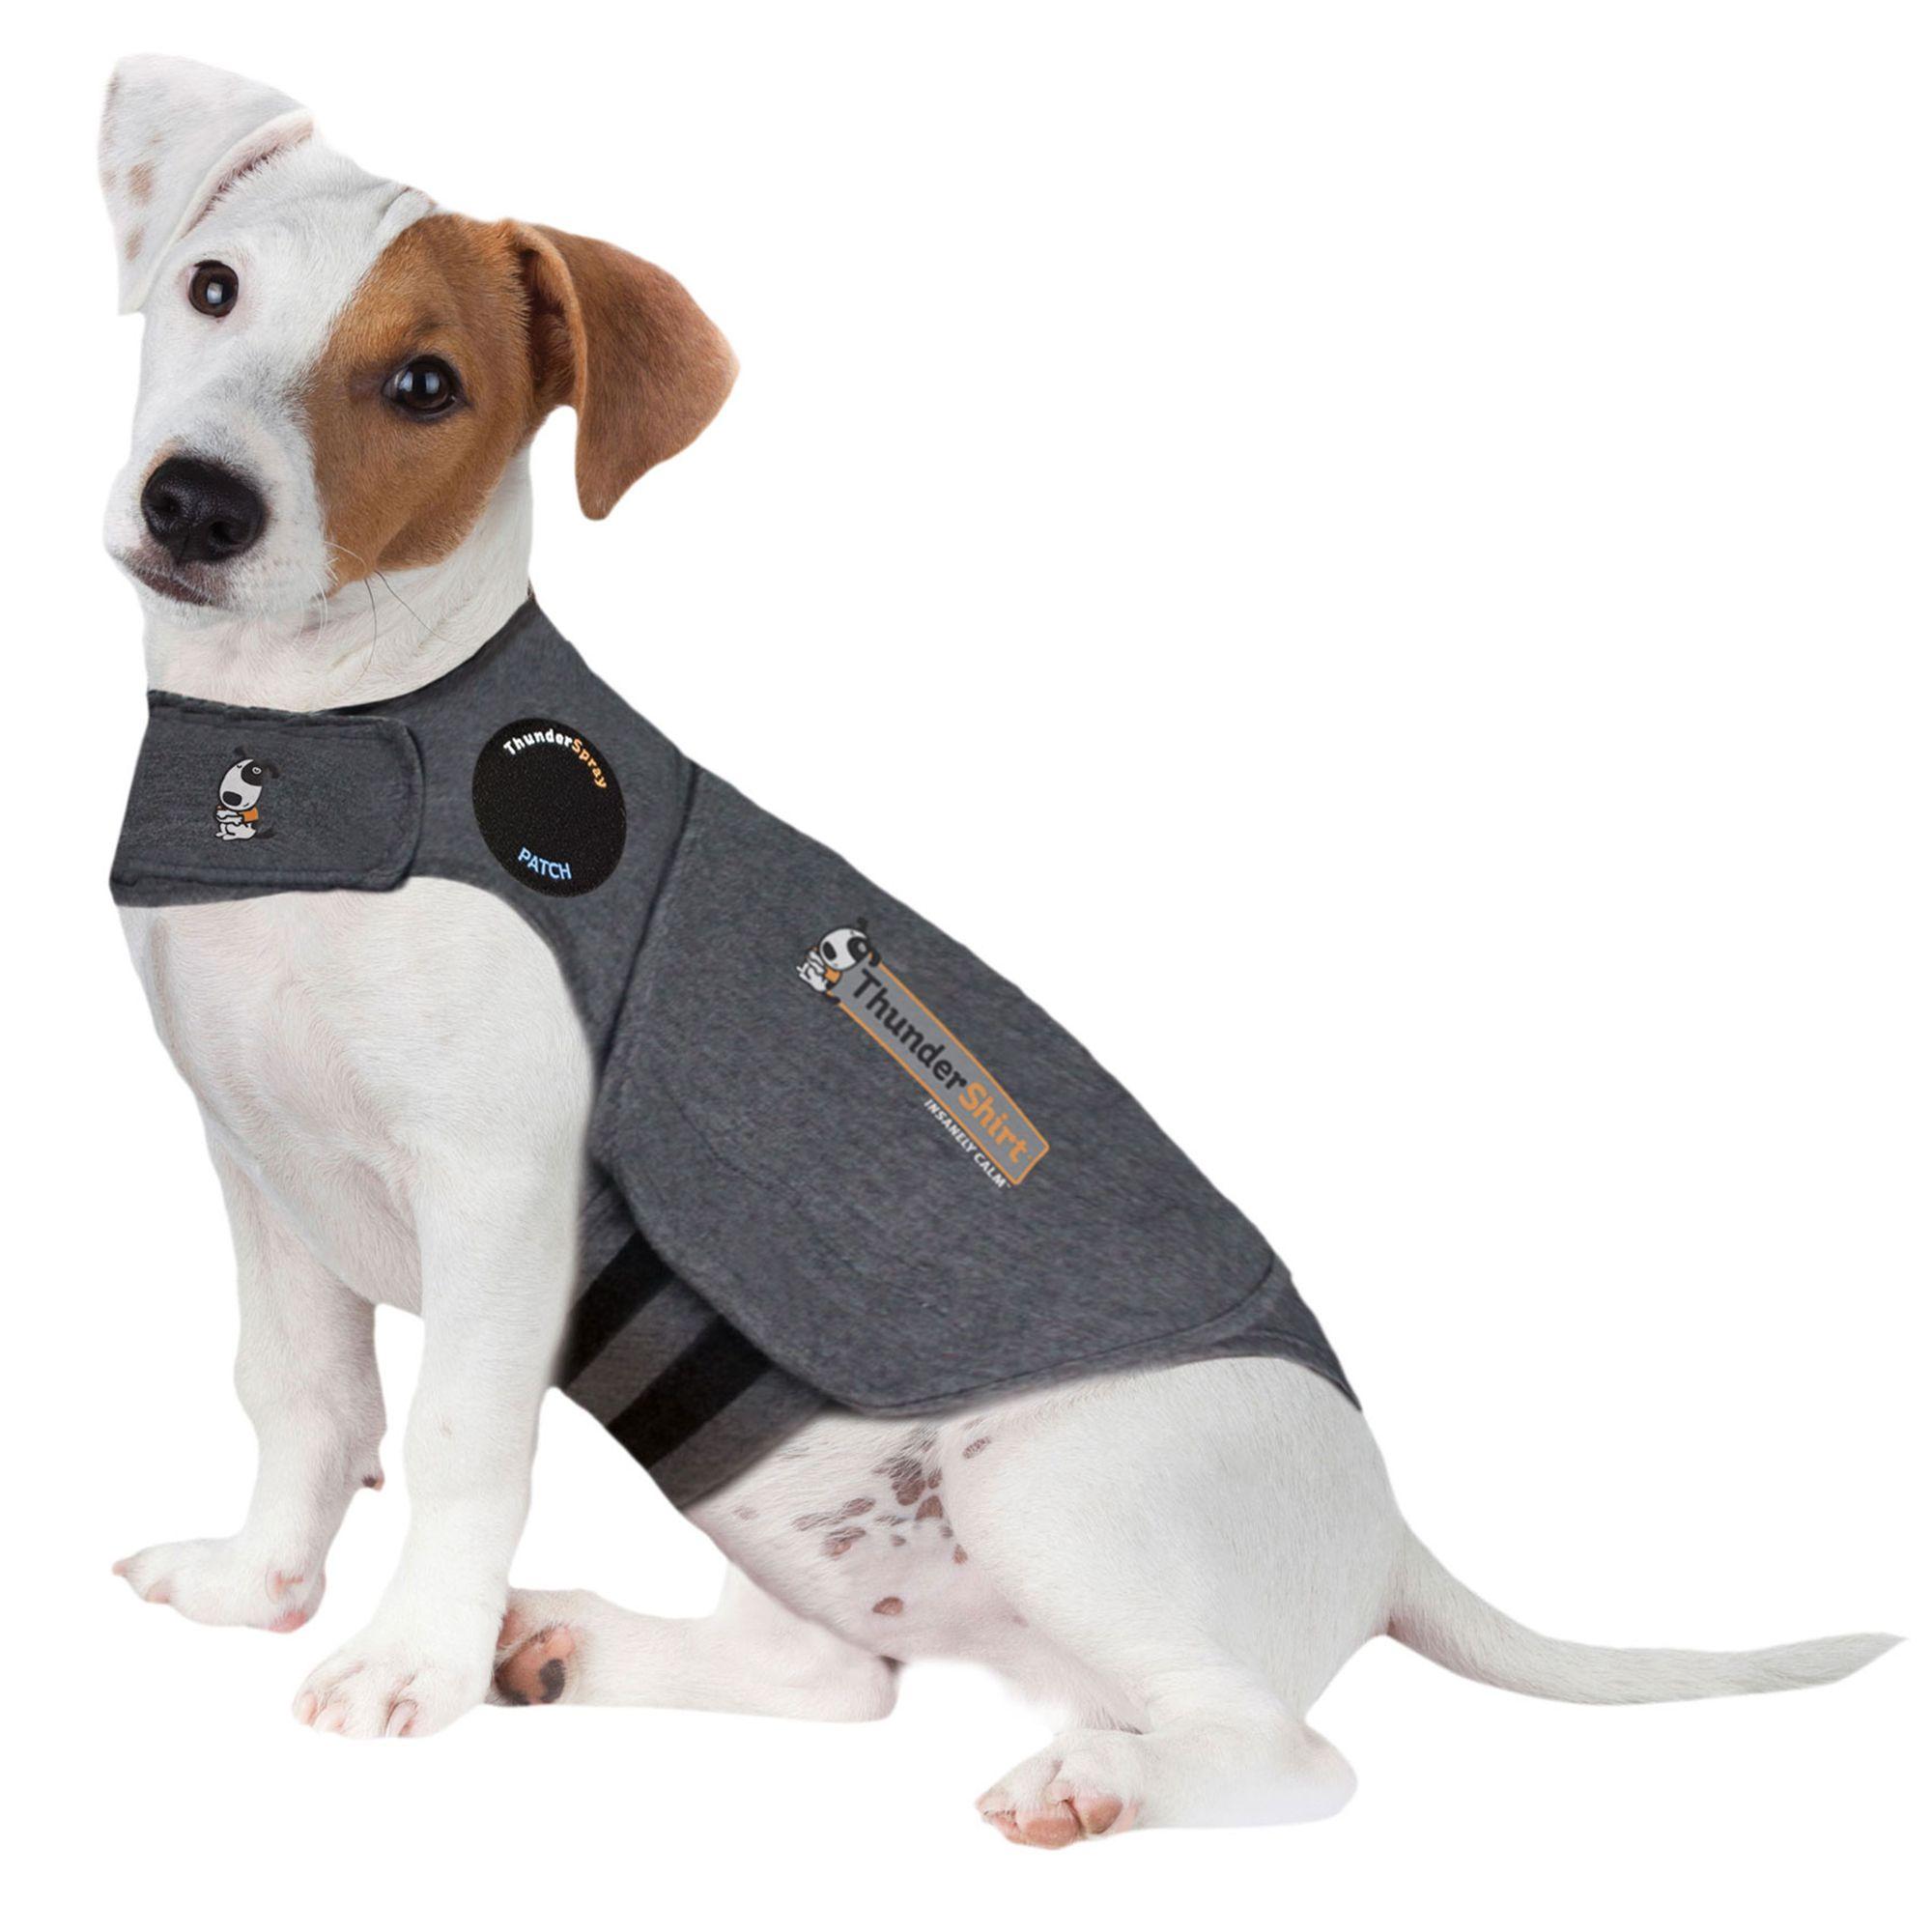 Thundershirt Dog Anxiety Shirt Size Small